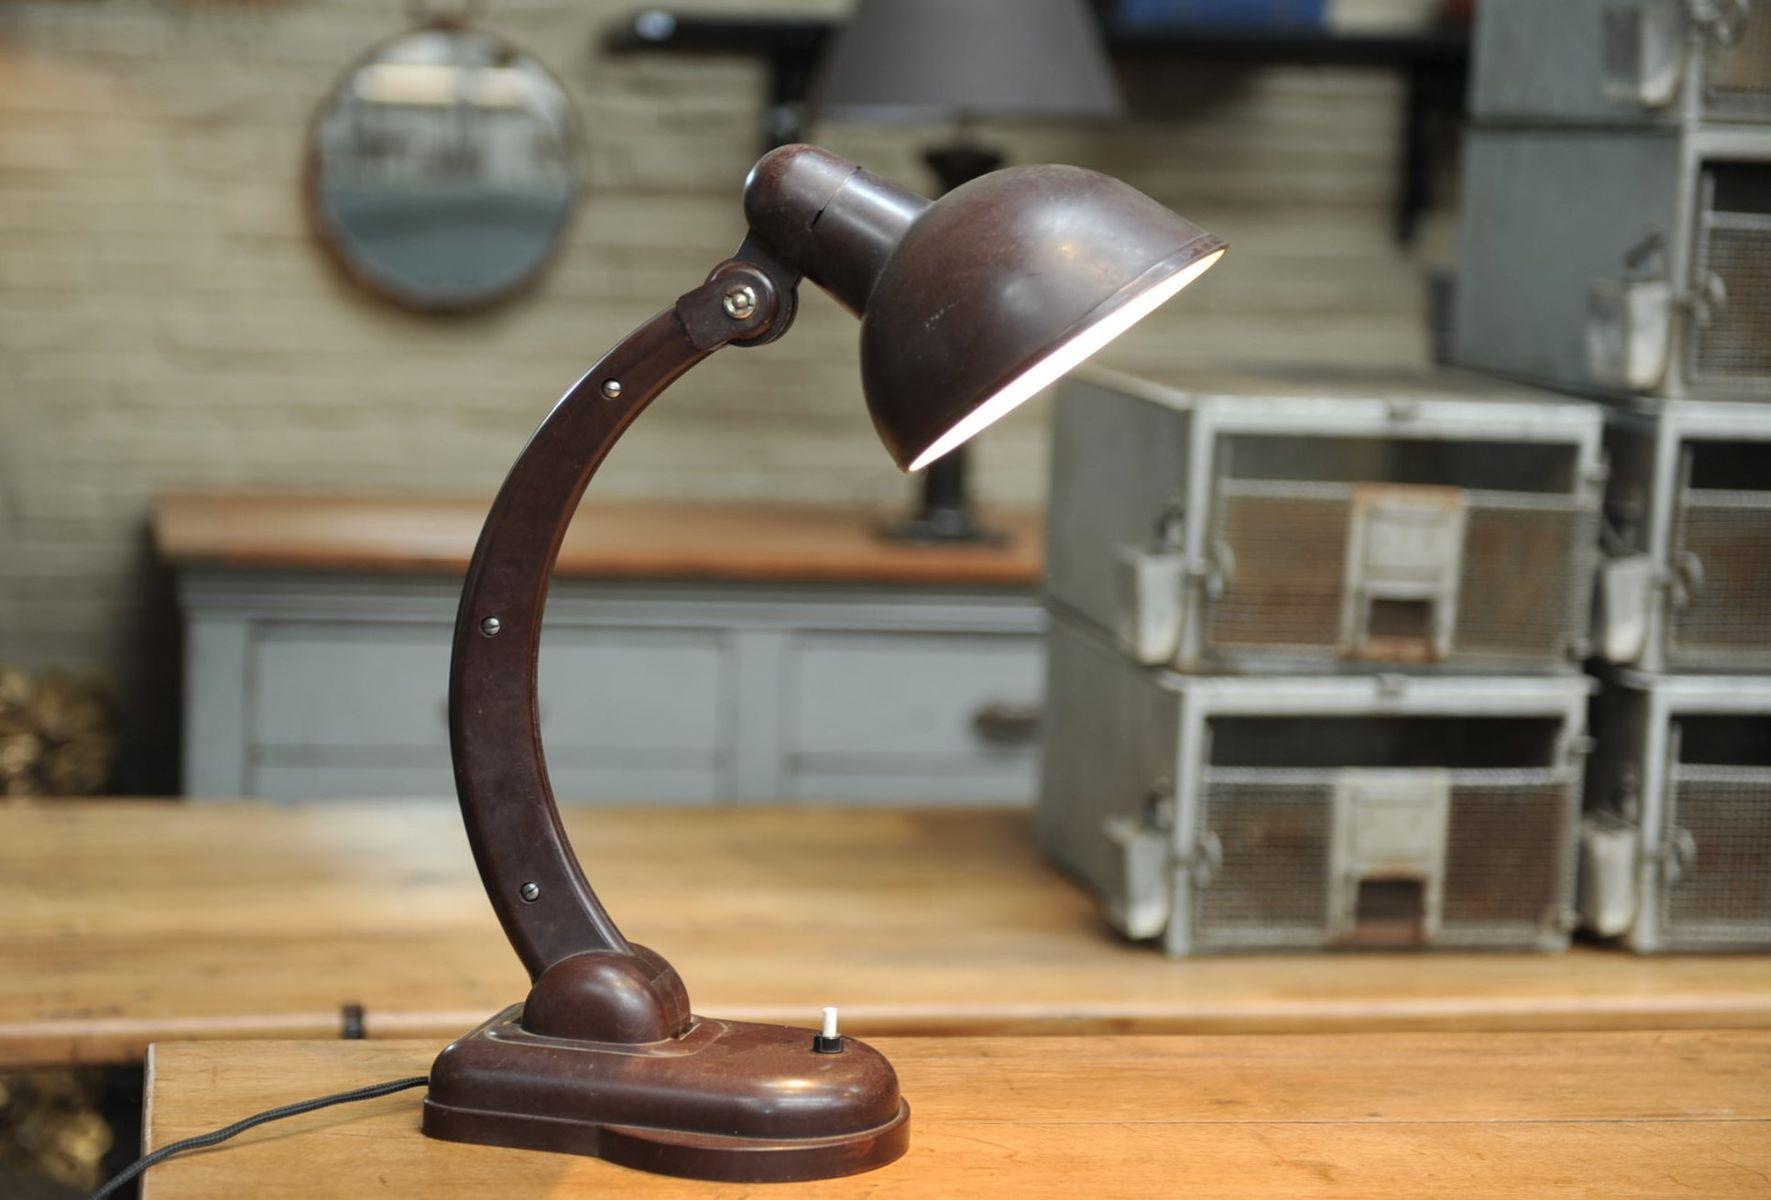 Lampe de bureau articul e en bak lite france 1930s en vente sur pamono - Lampe bureau articulee ...